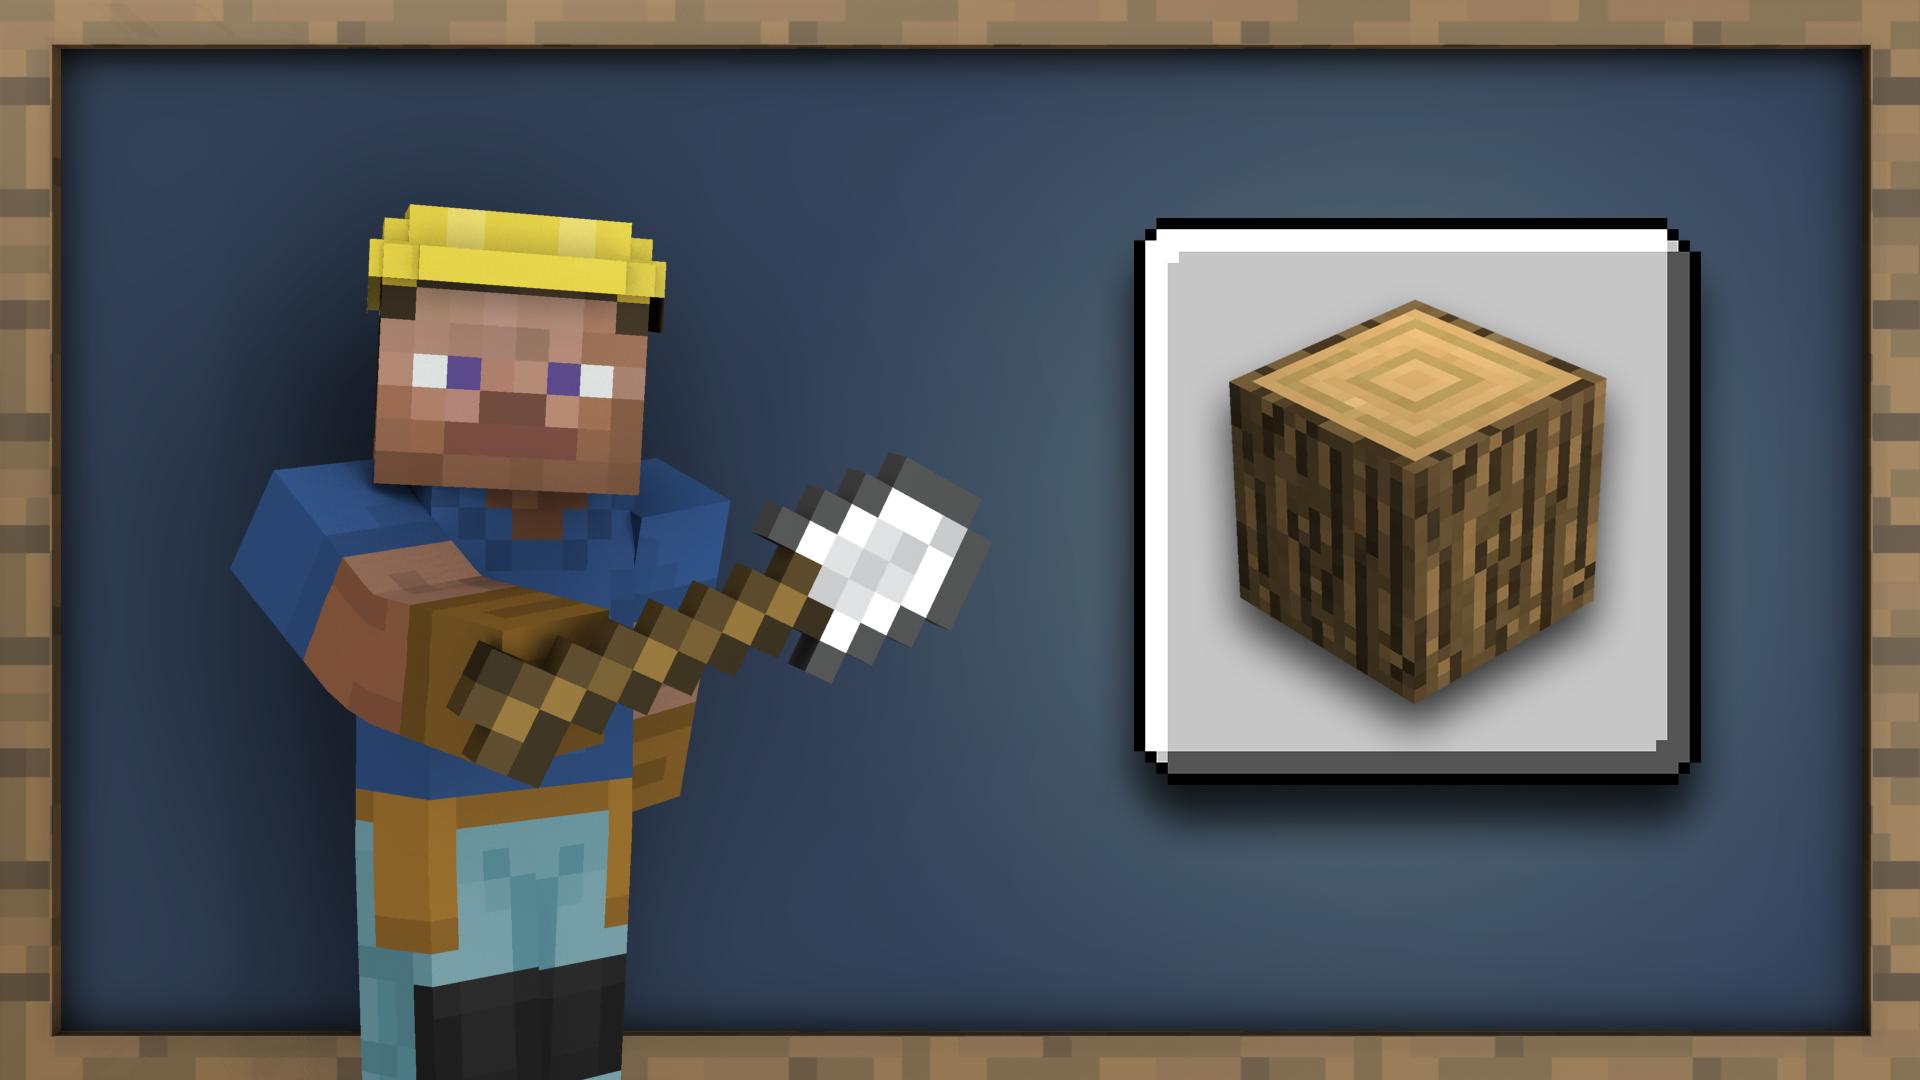 Getting Wood